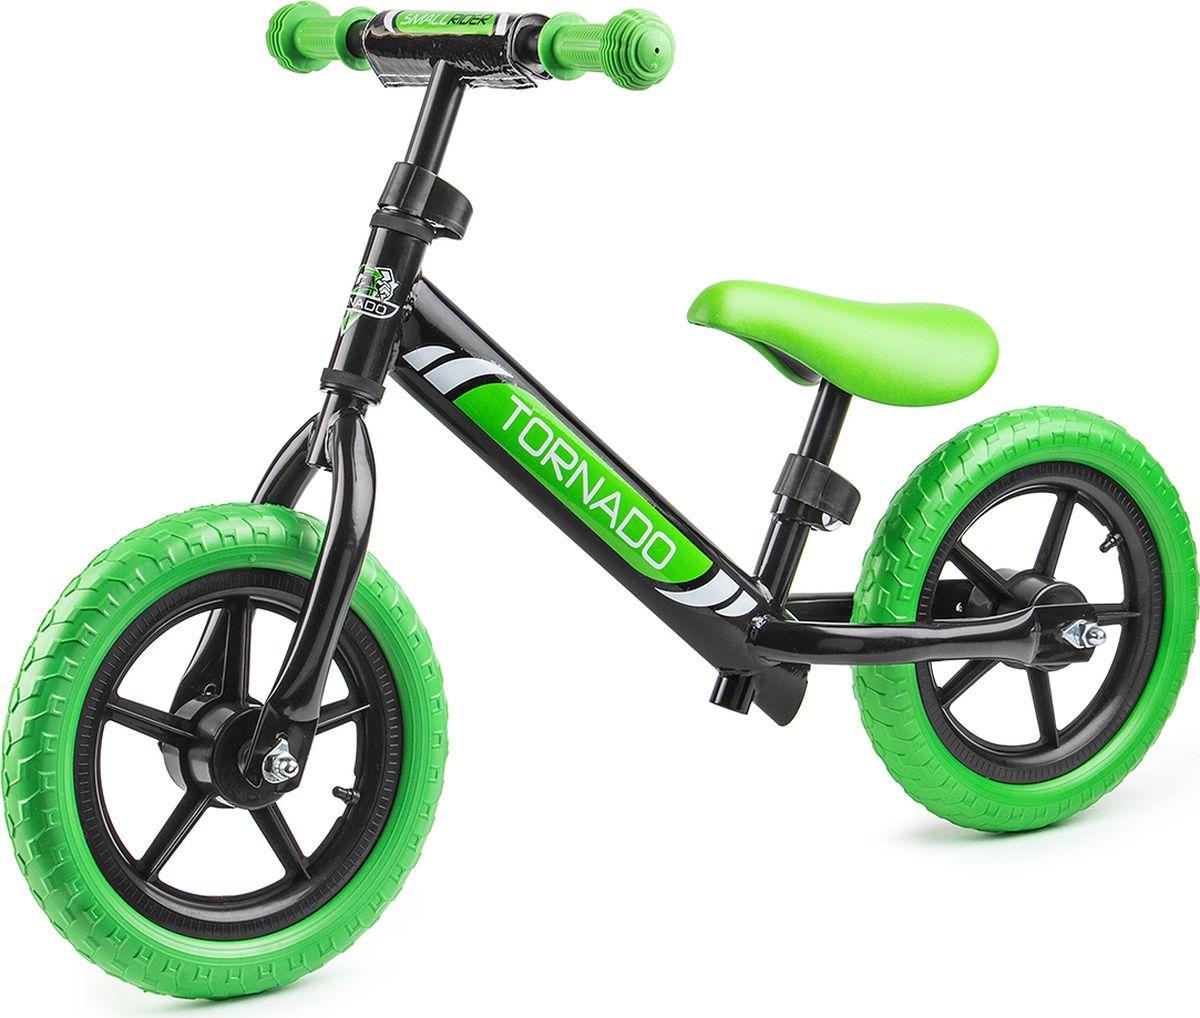 Small Rider Беговел детский Tornado цвет черный зеленый - Беговелы